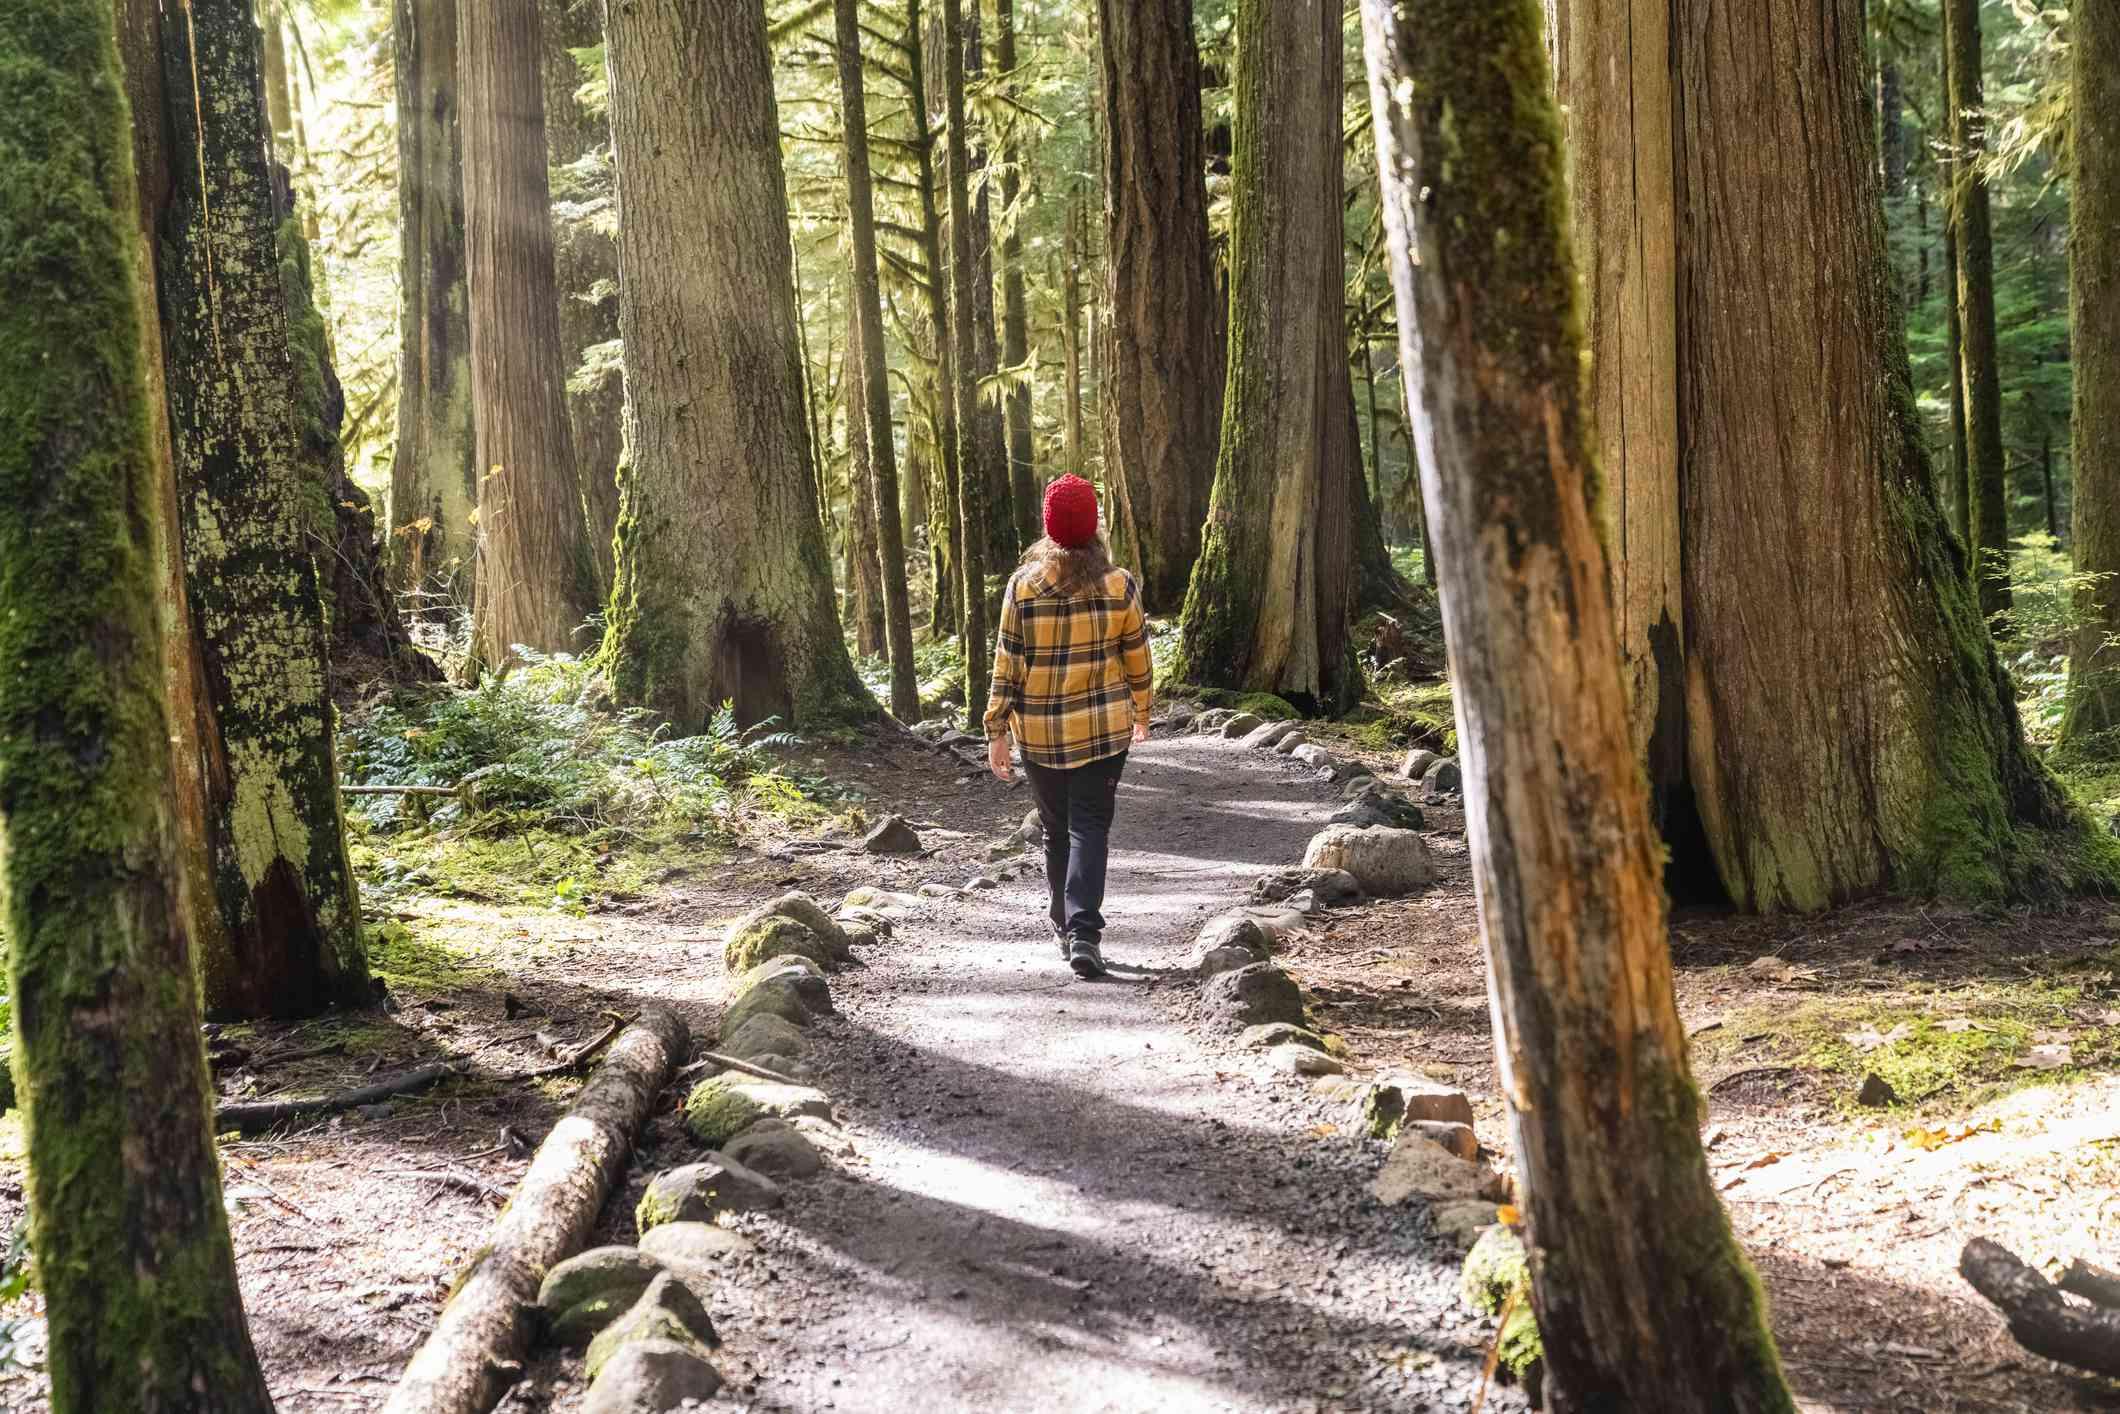 Hiking on a designated trail